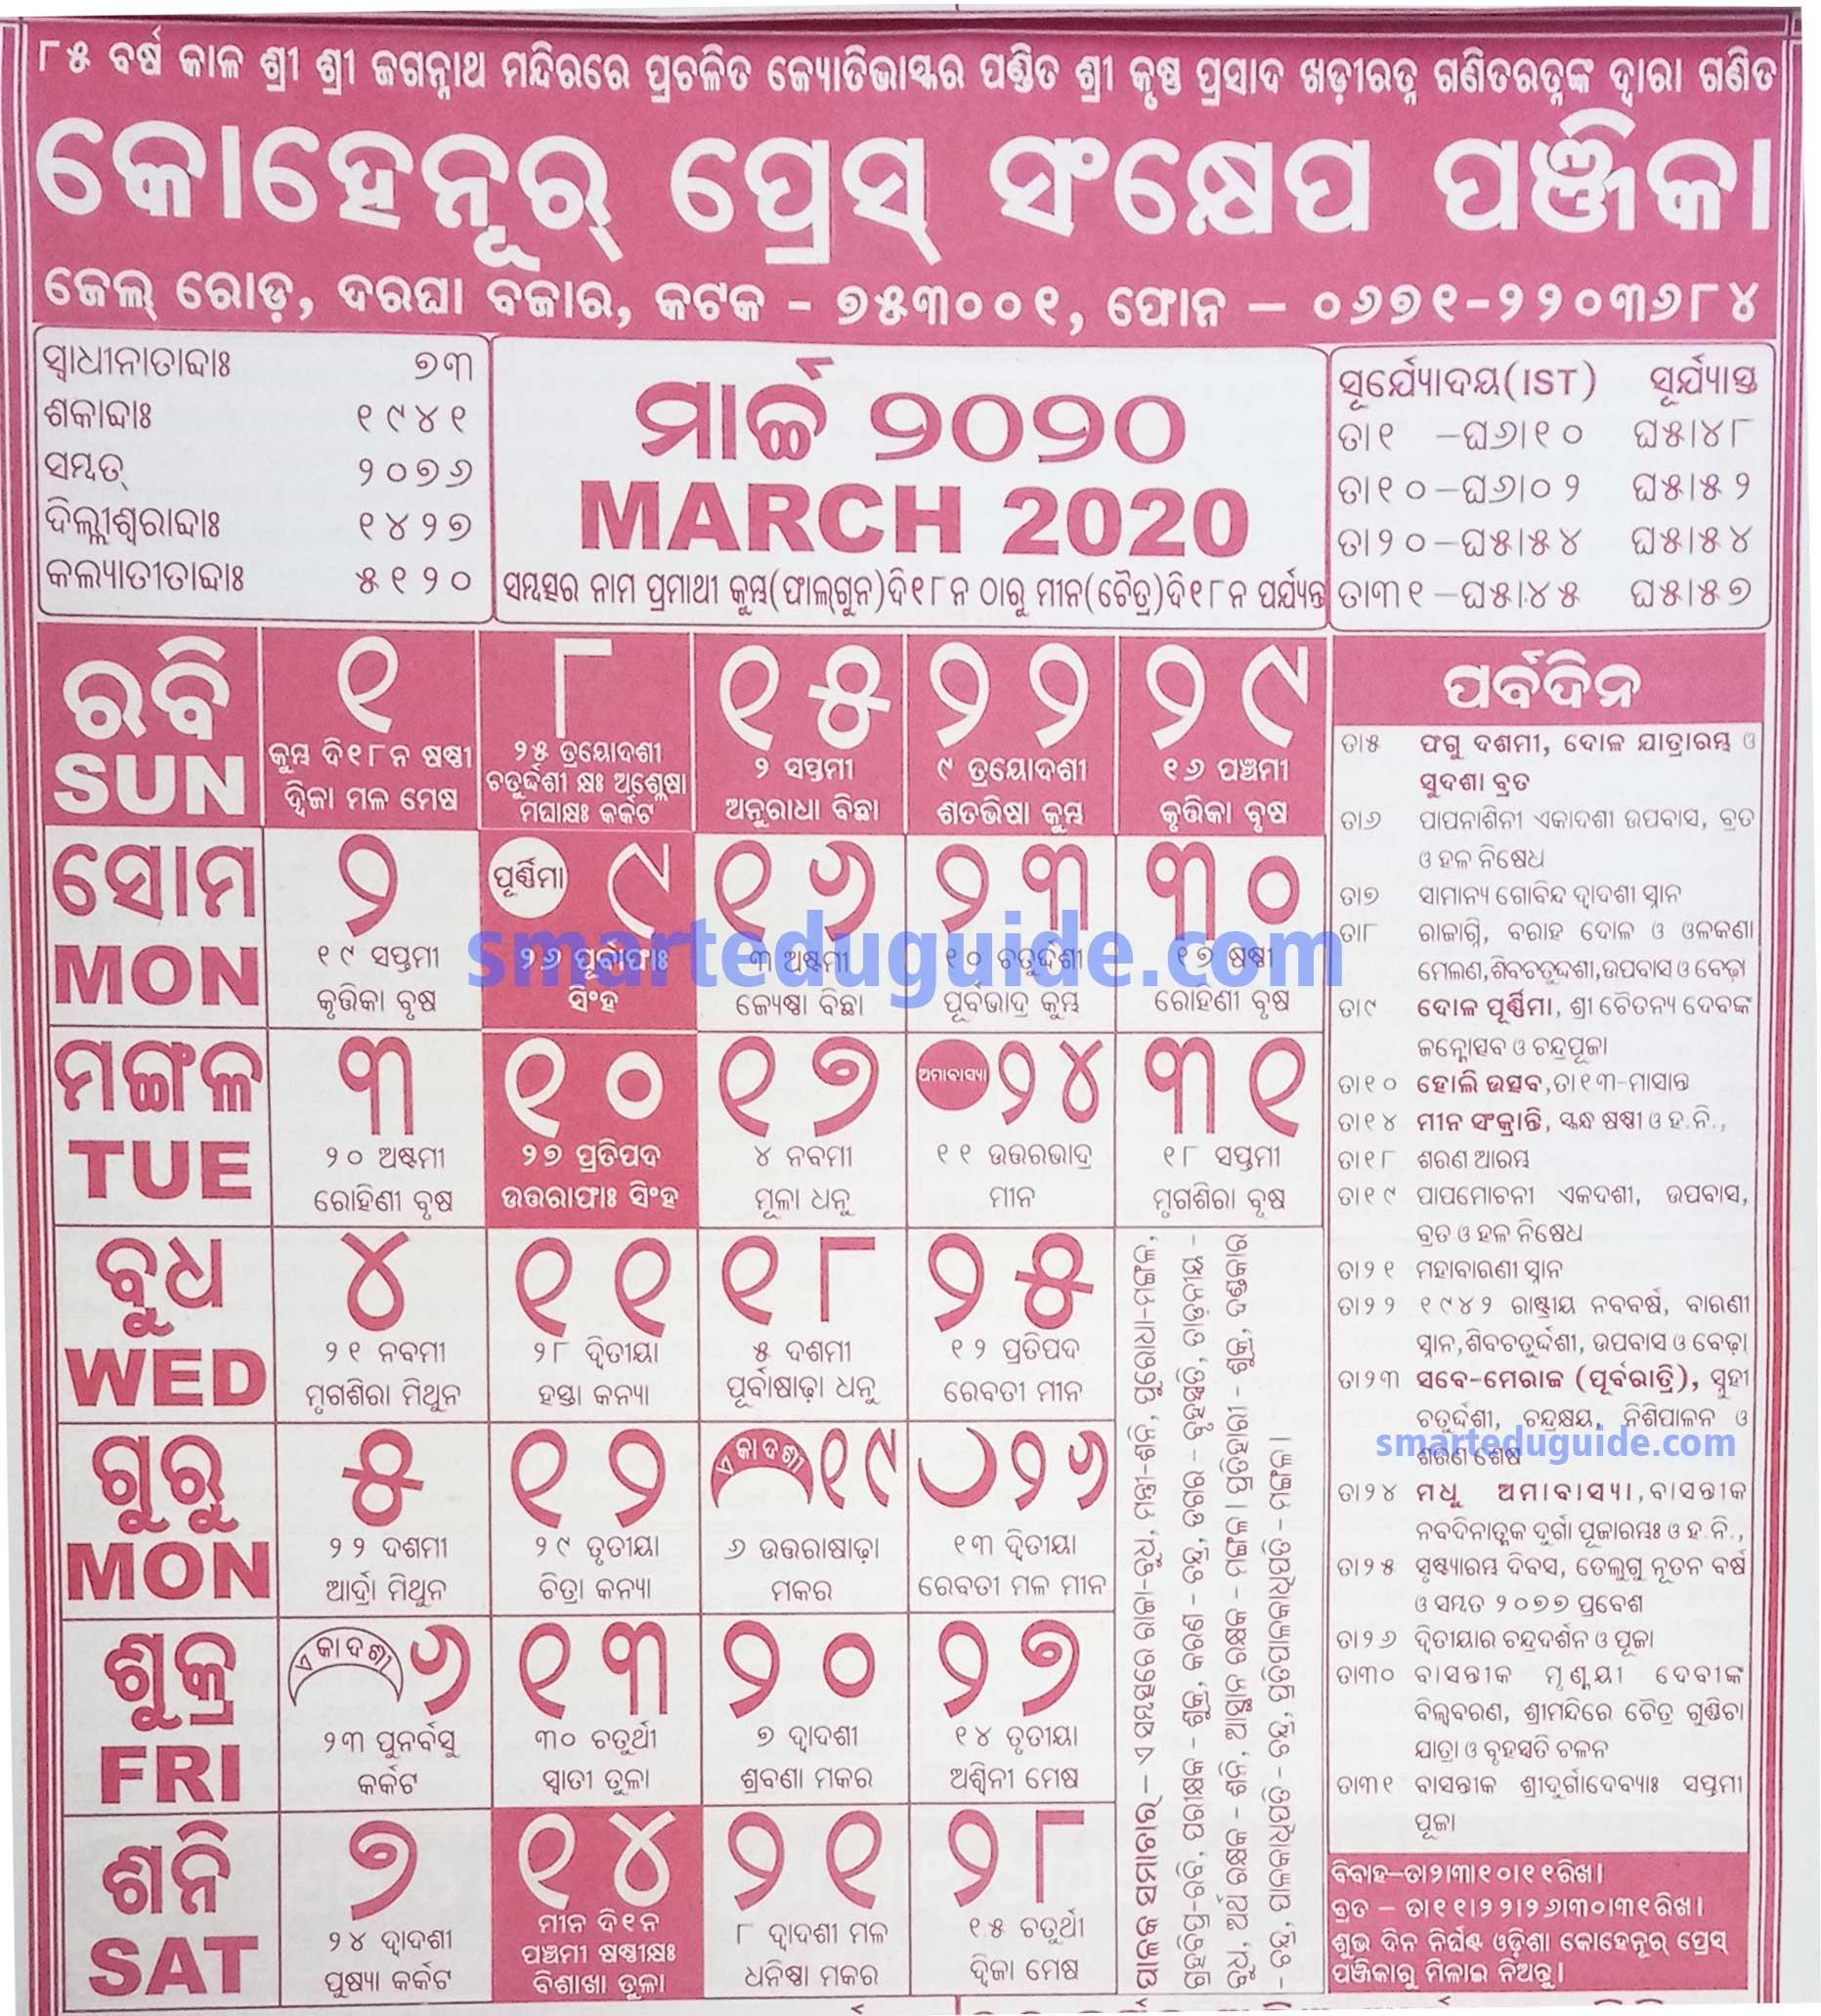 Odia Kohinoor Calendar 2020 March | Odishain with 2020 Oriya Calendar